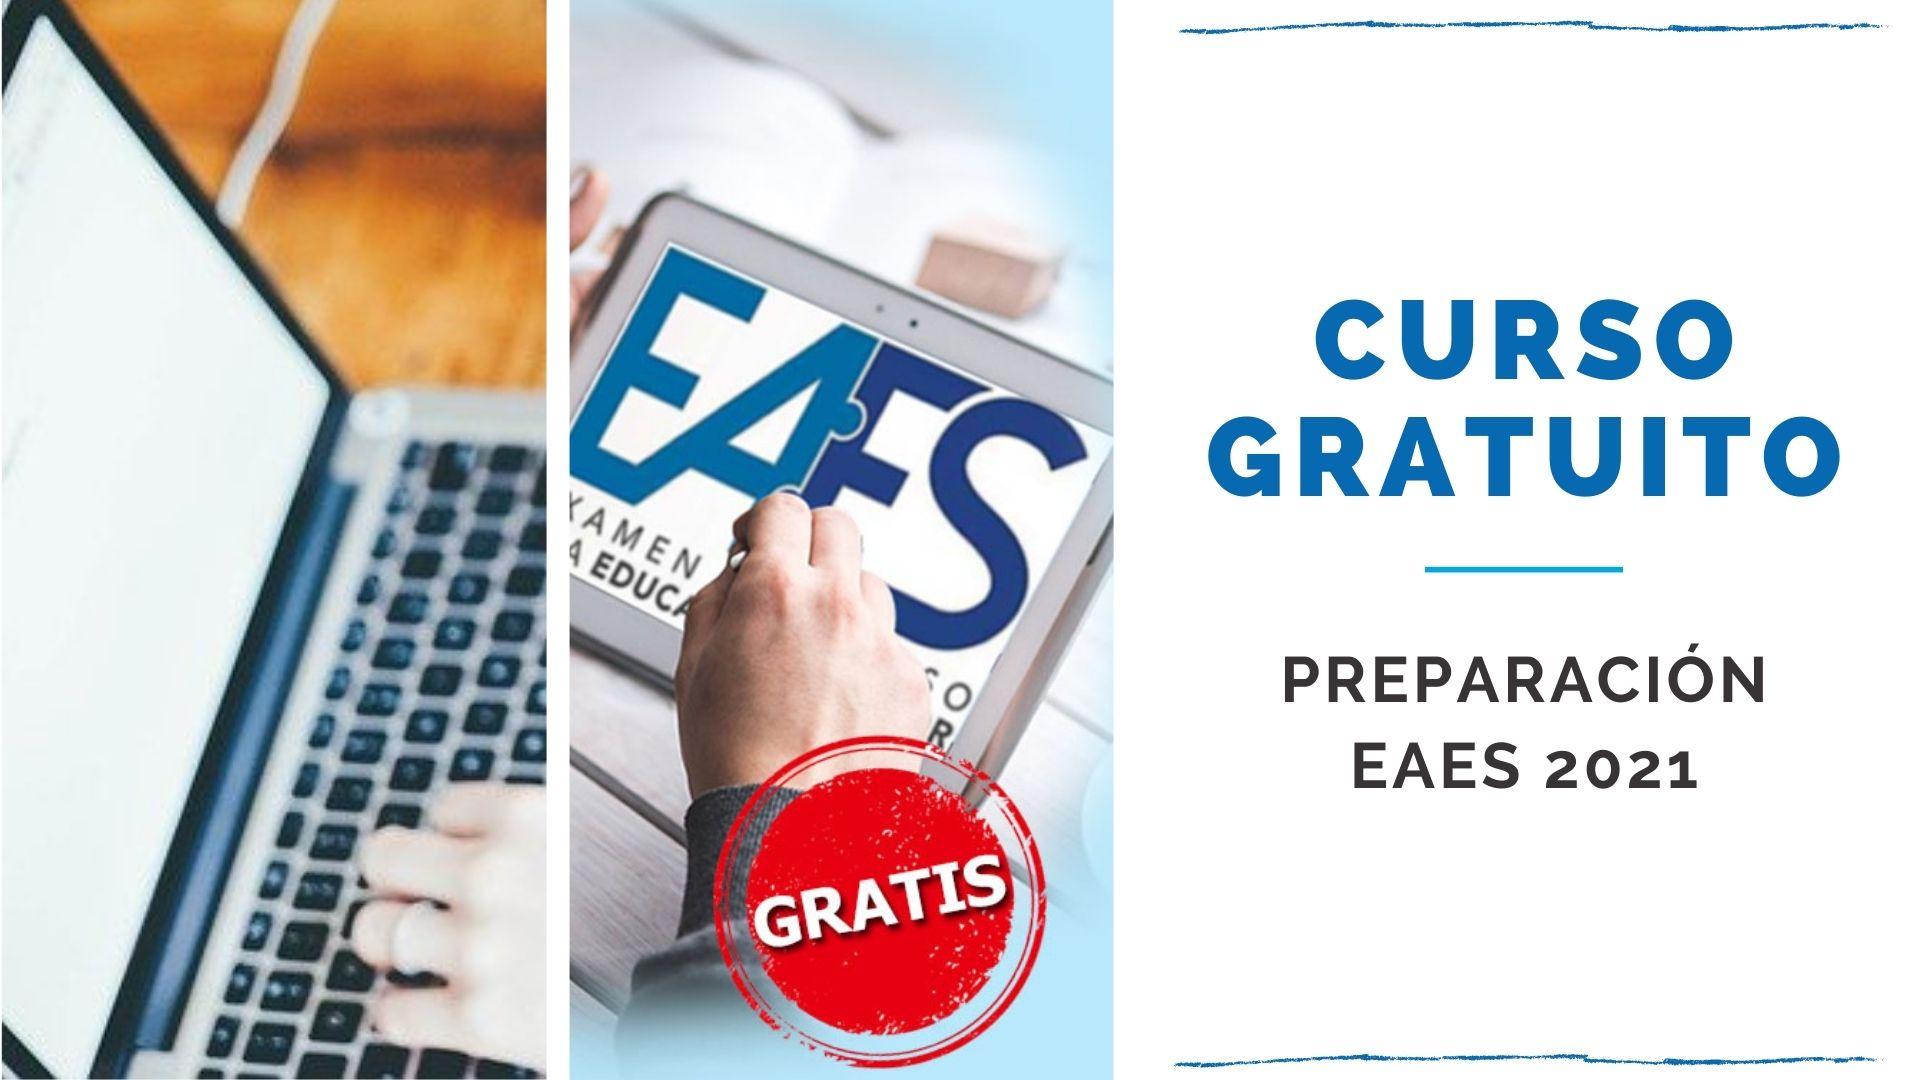 Curso gratuito EAES 2021